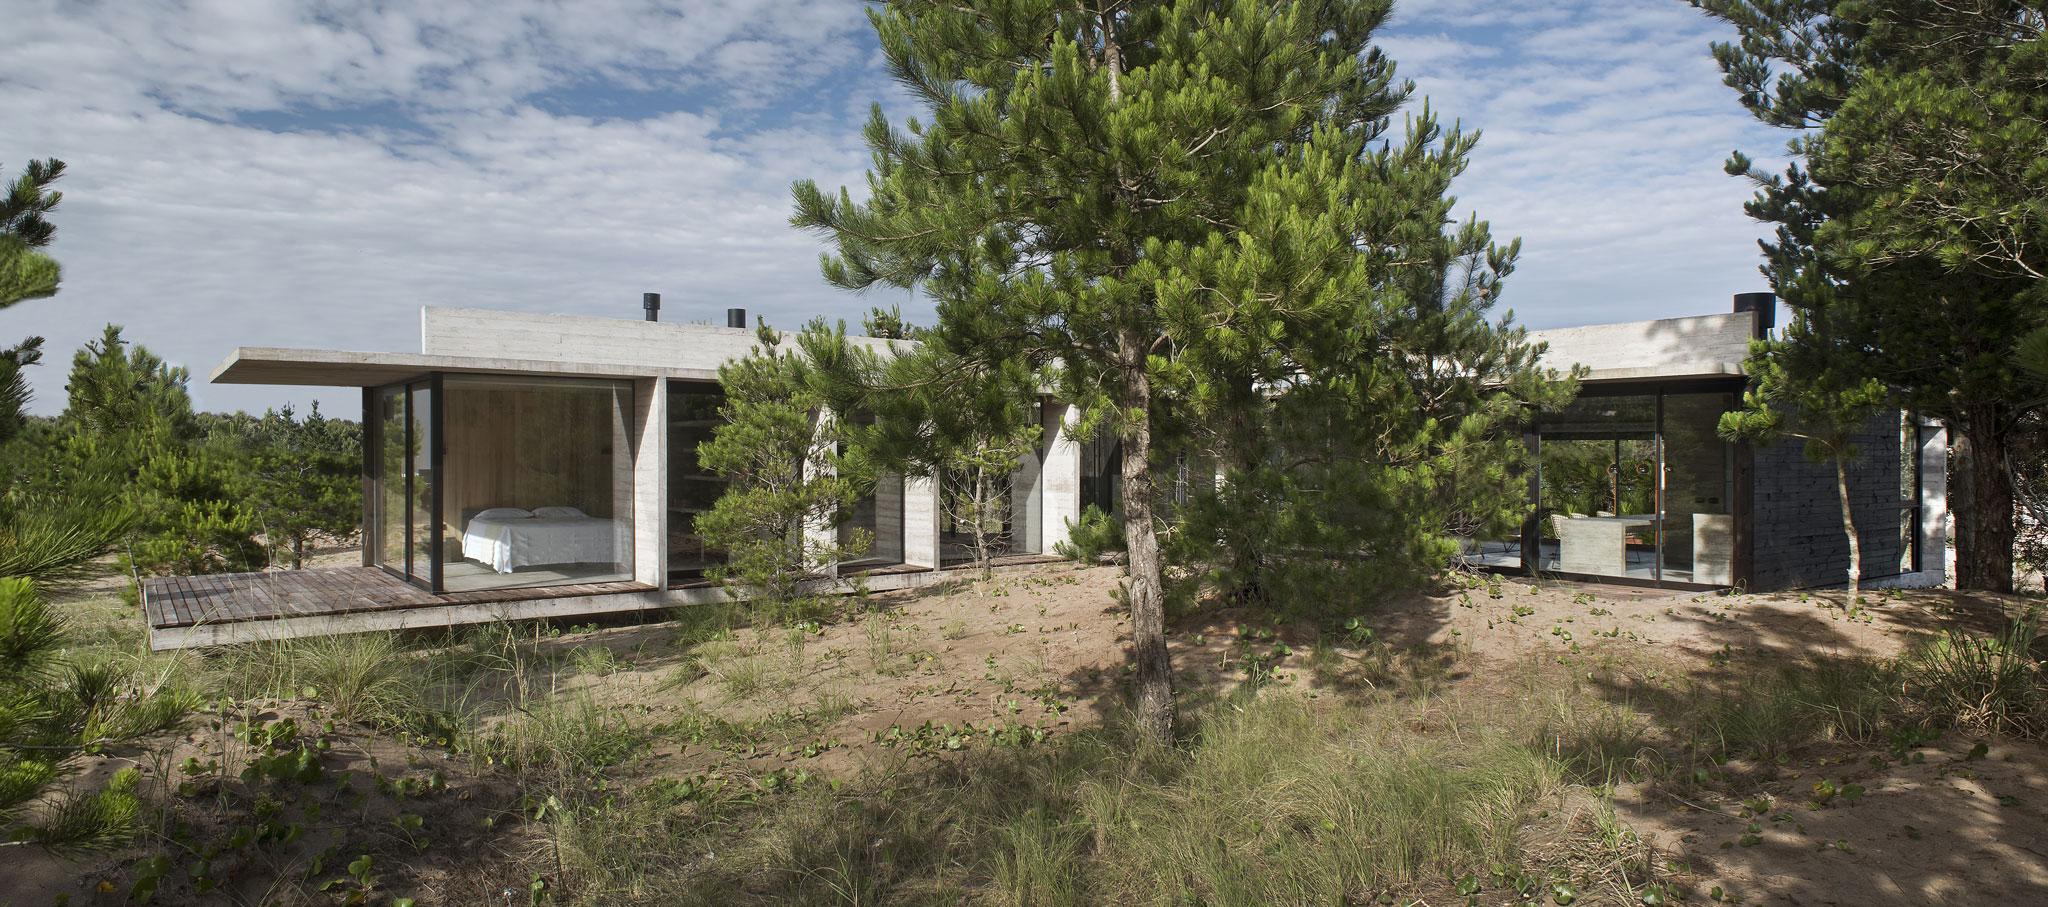 Vista exterior. Casa Ecuestre por Luciano Kruk arquitectos. Cortesía de Luciano Kruk arquitectos